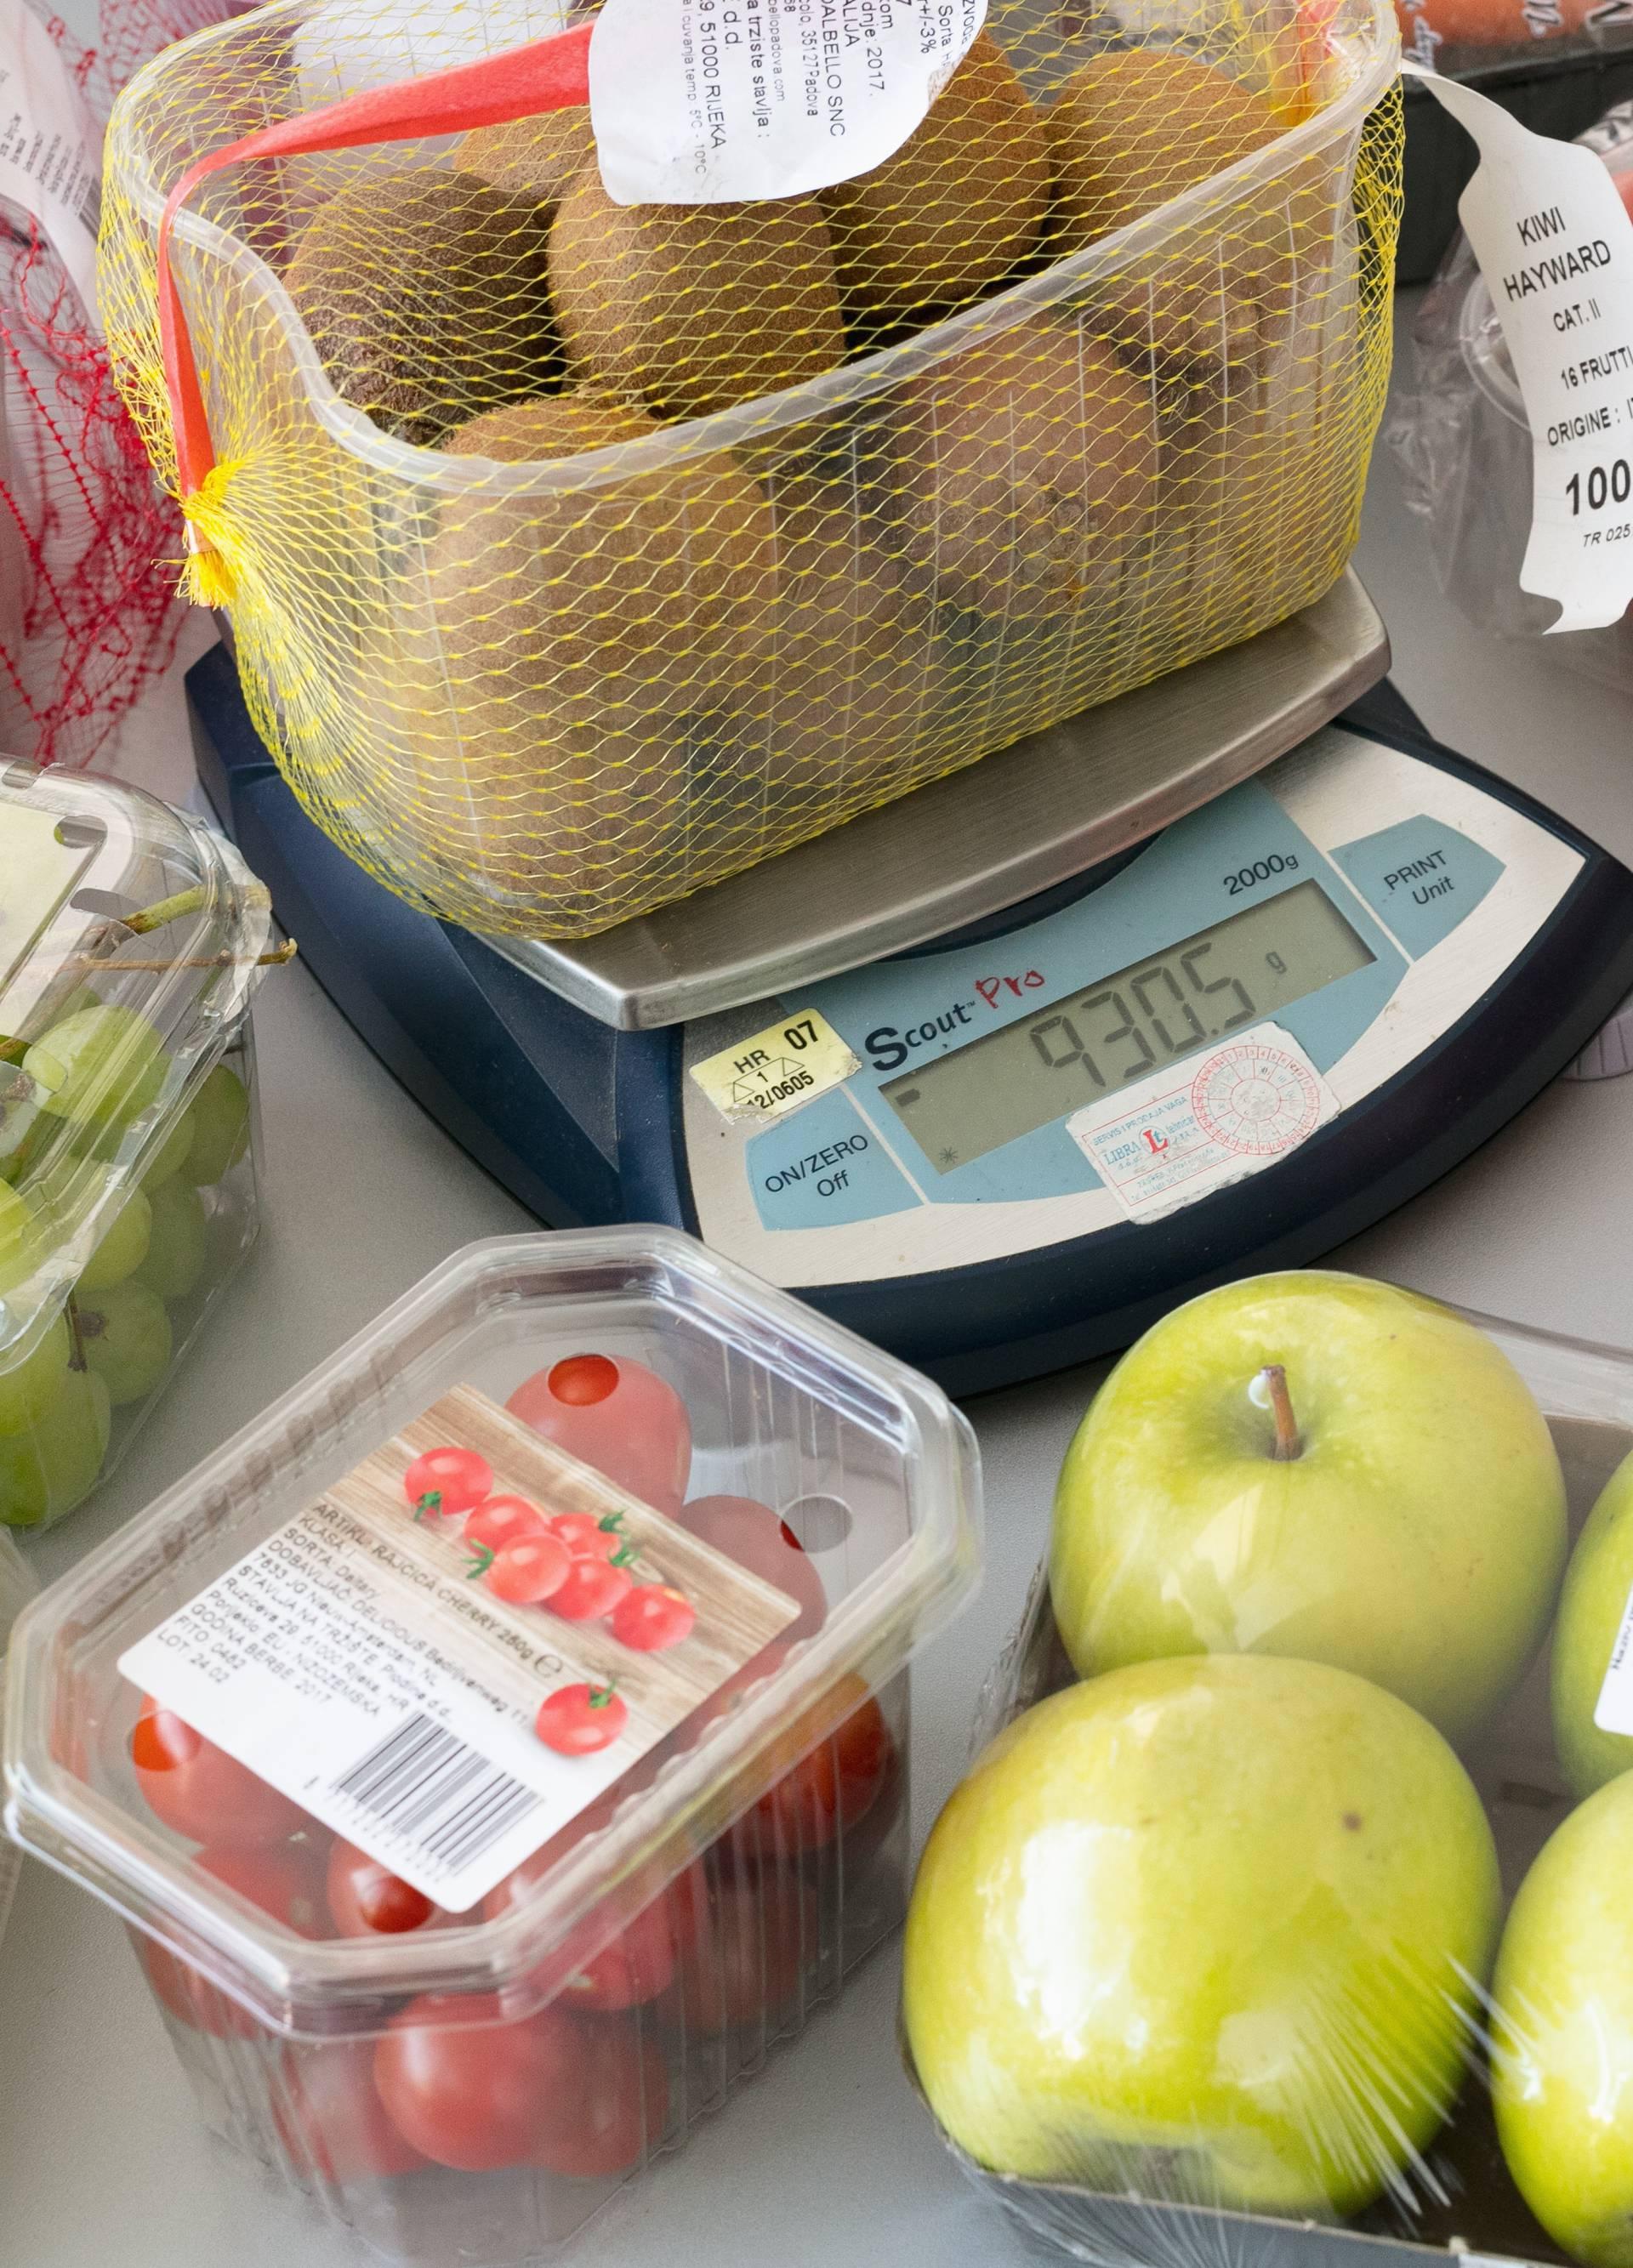 Bolje je vagati sam: Na posudi piše kilogram, ali ima manje...